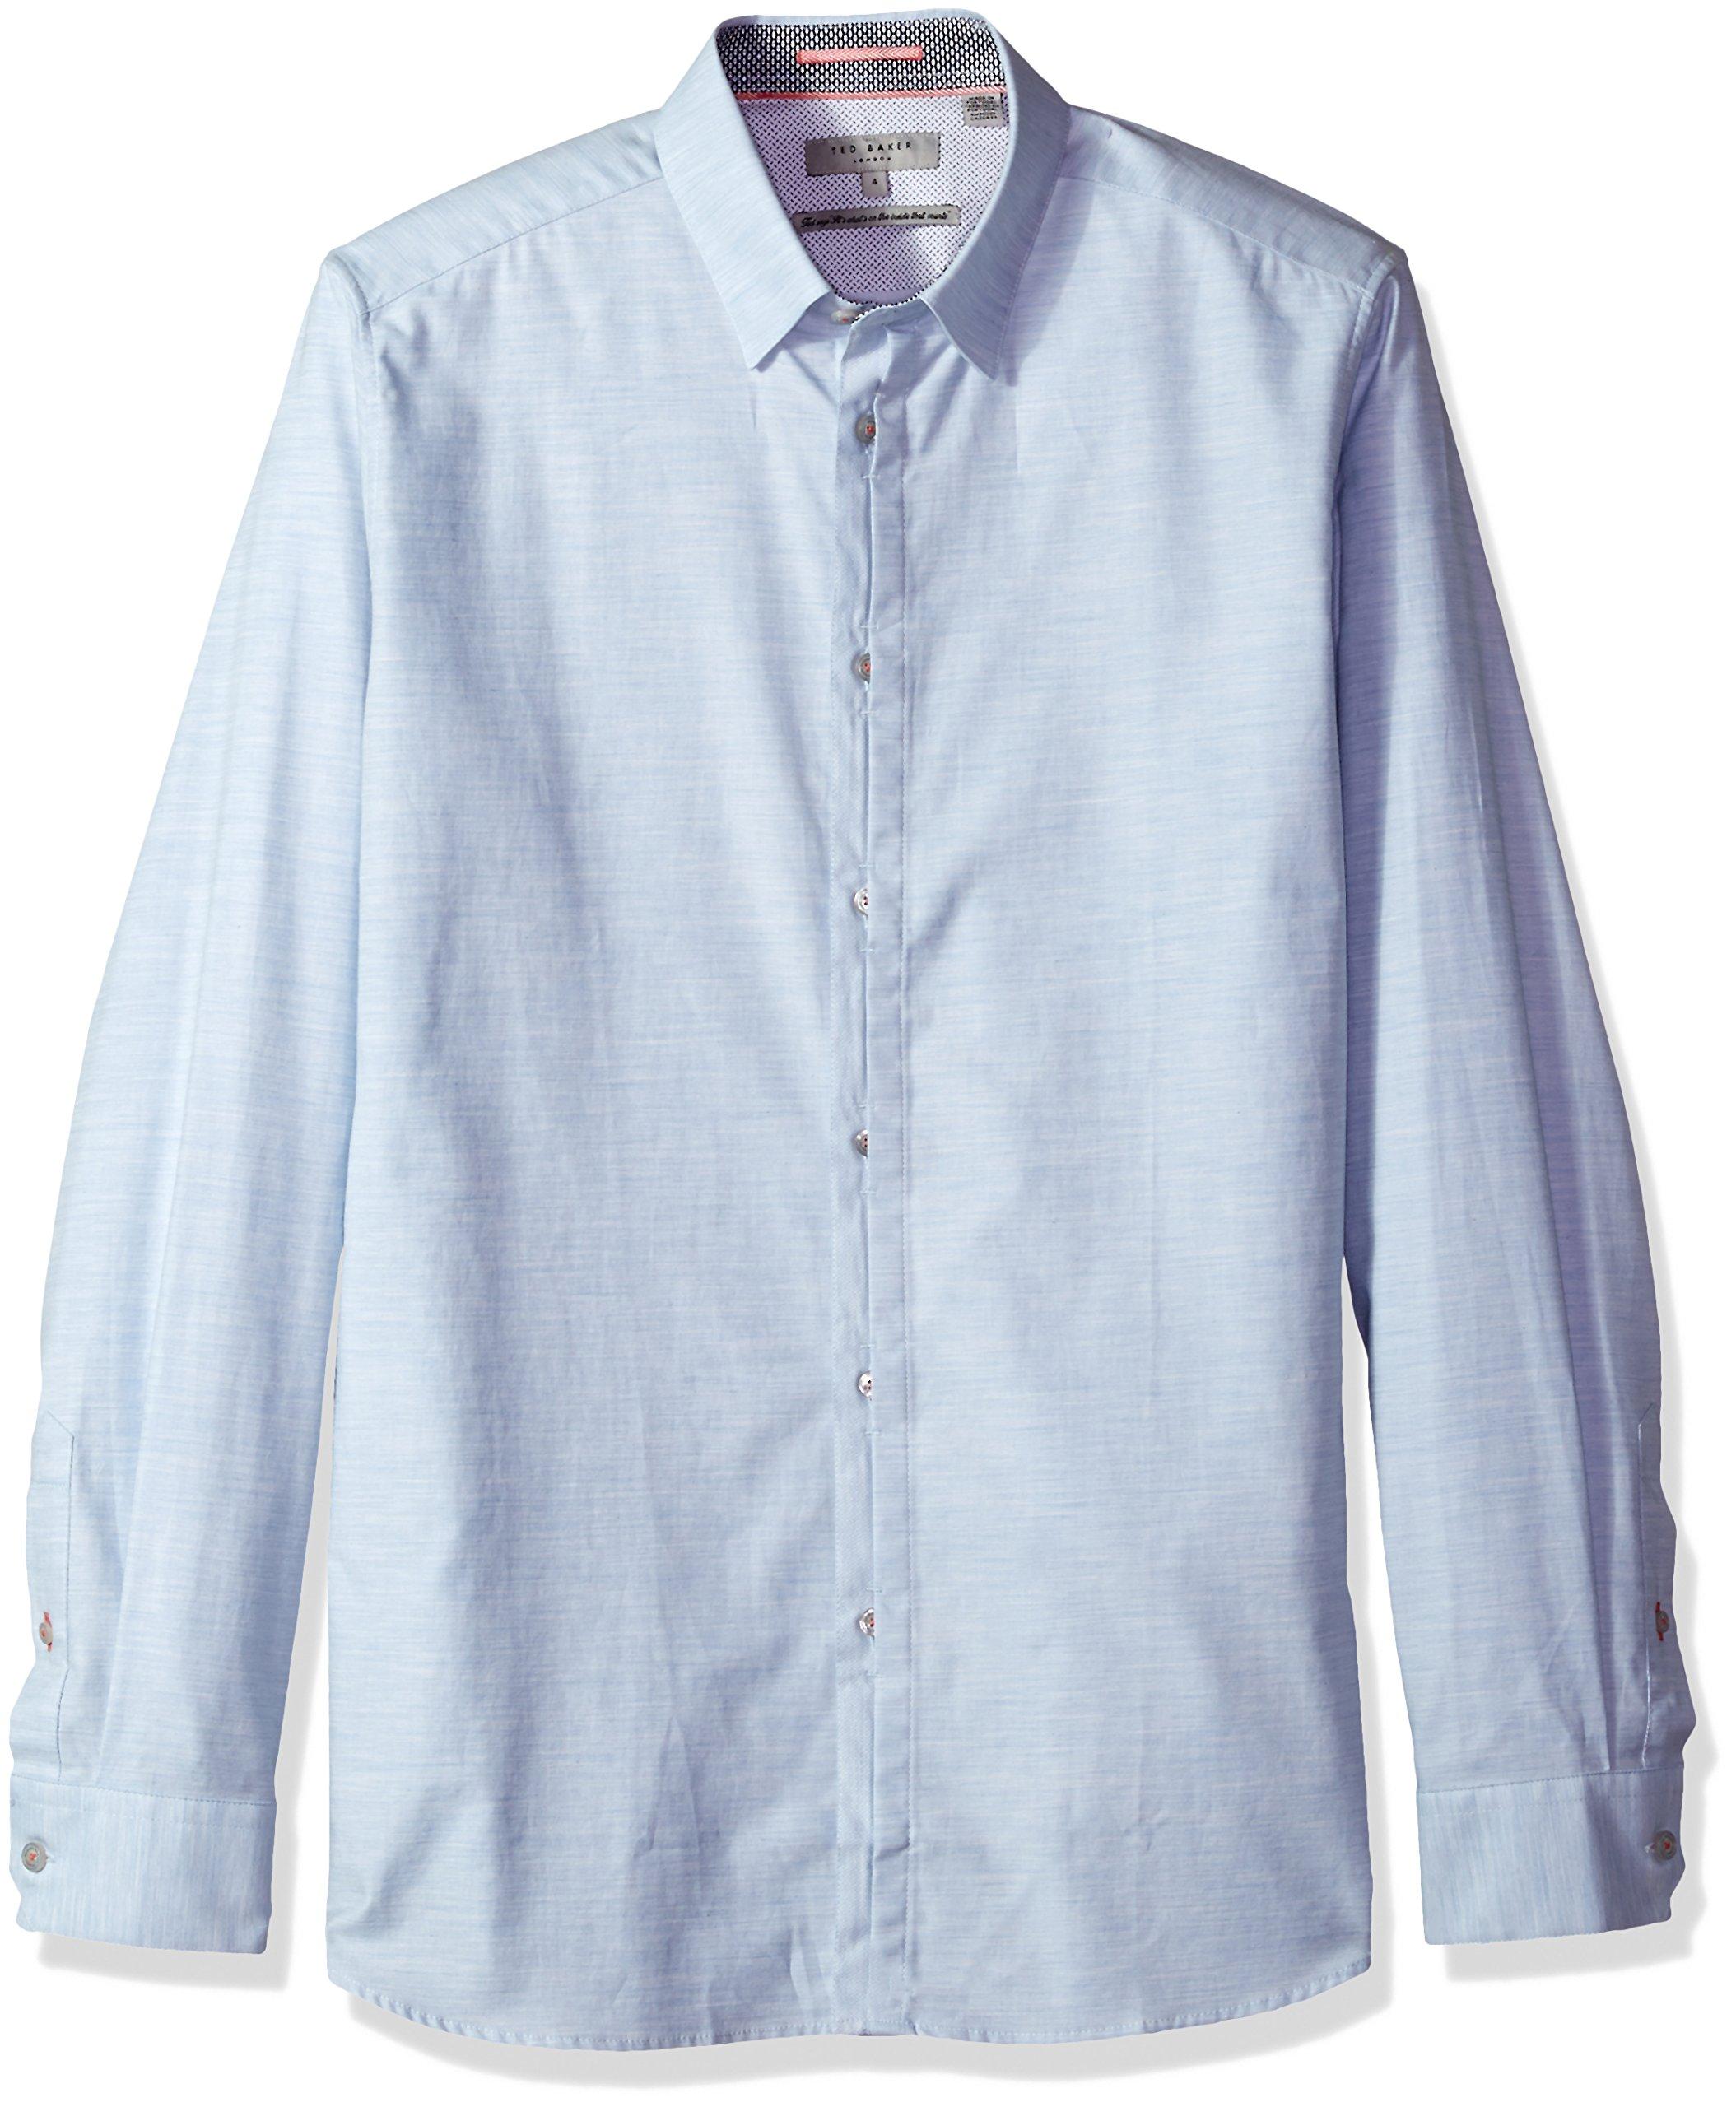 Ted Baker Men's Annisy Modern Slim Fit LS Marl Cotton Shirt, Light Blue, 7